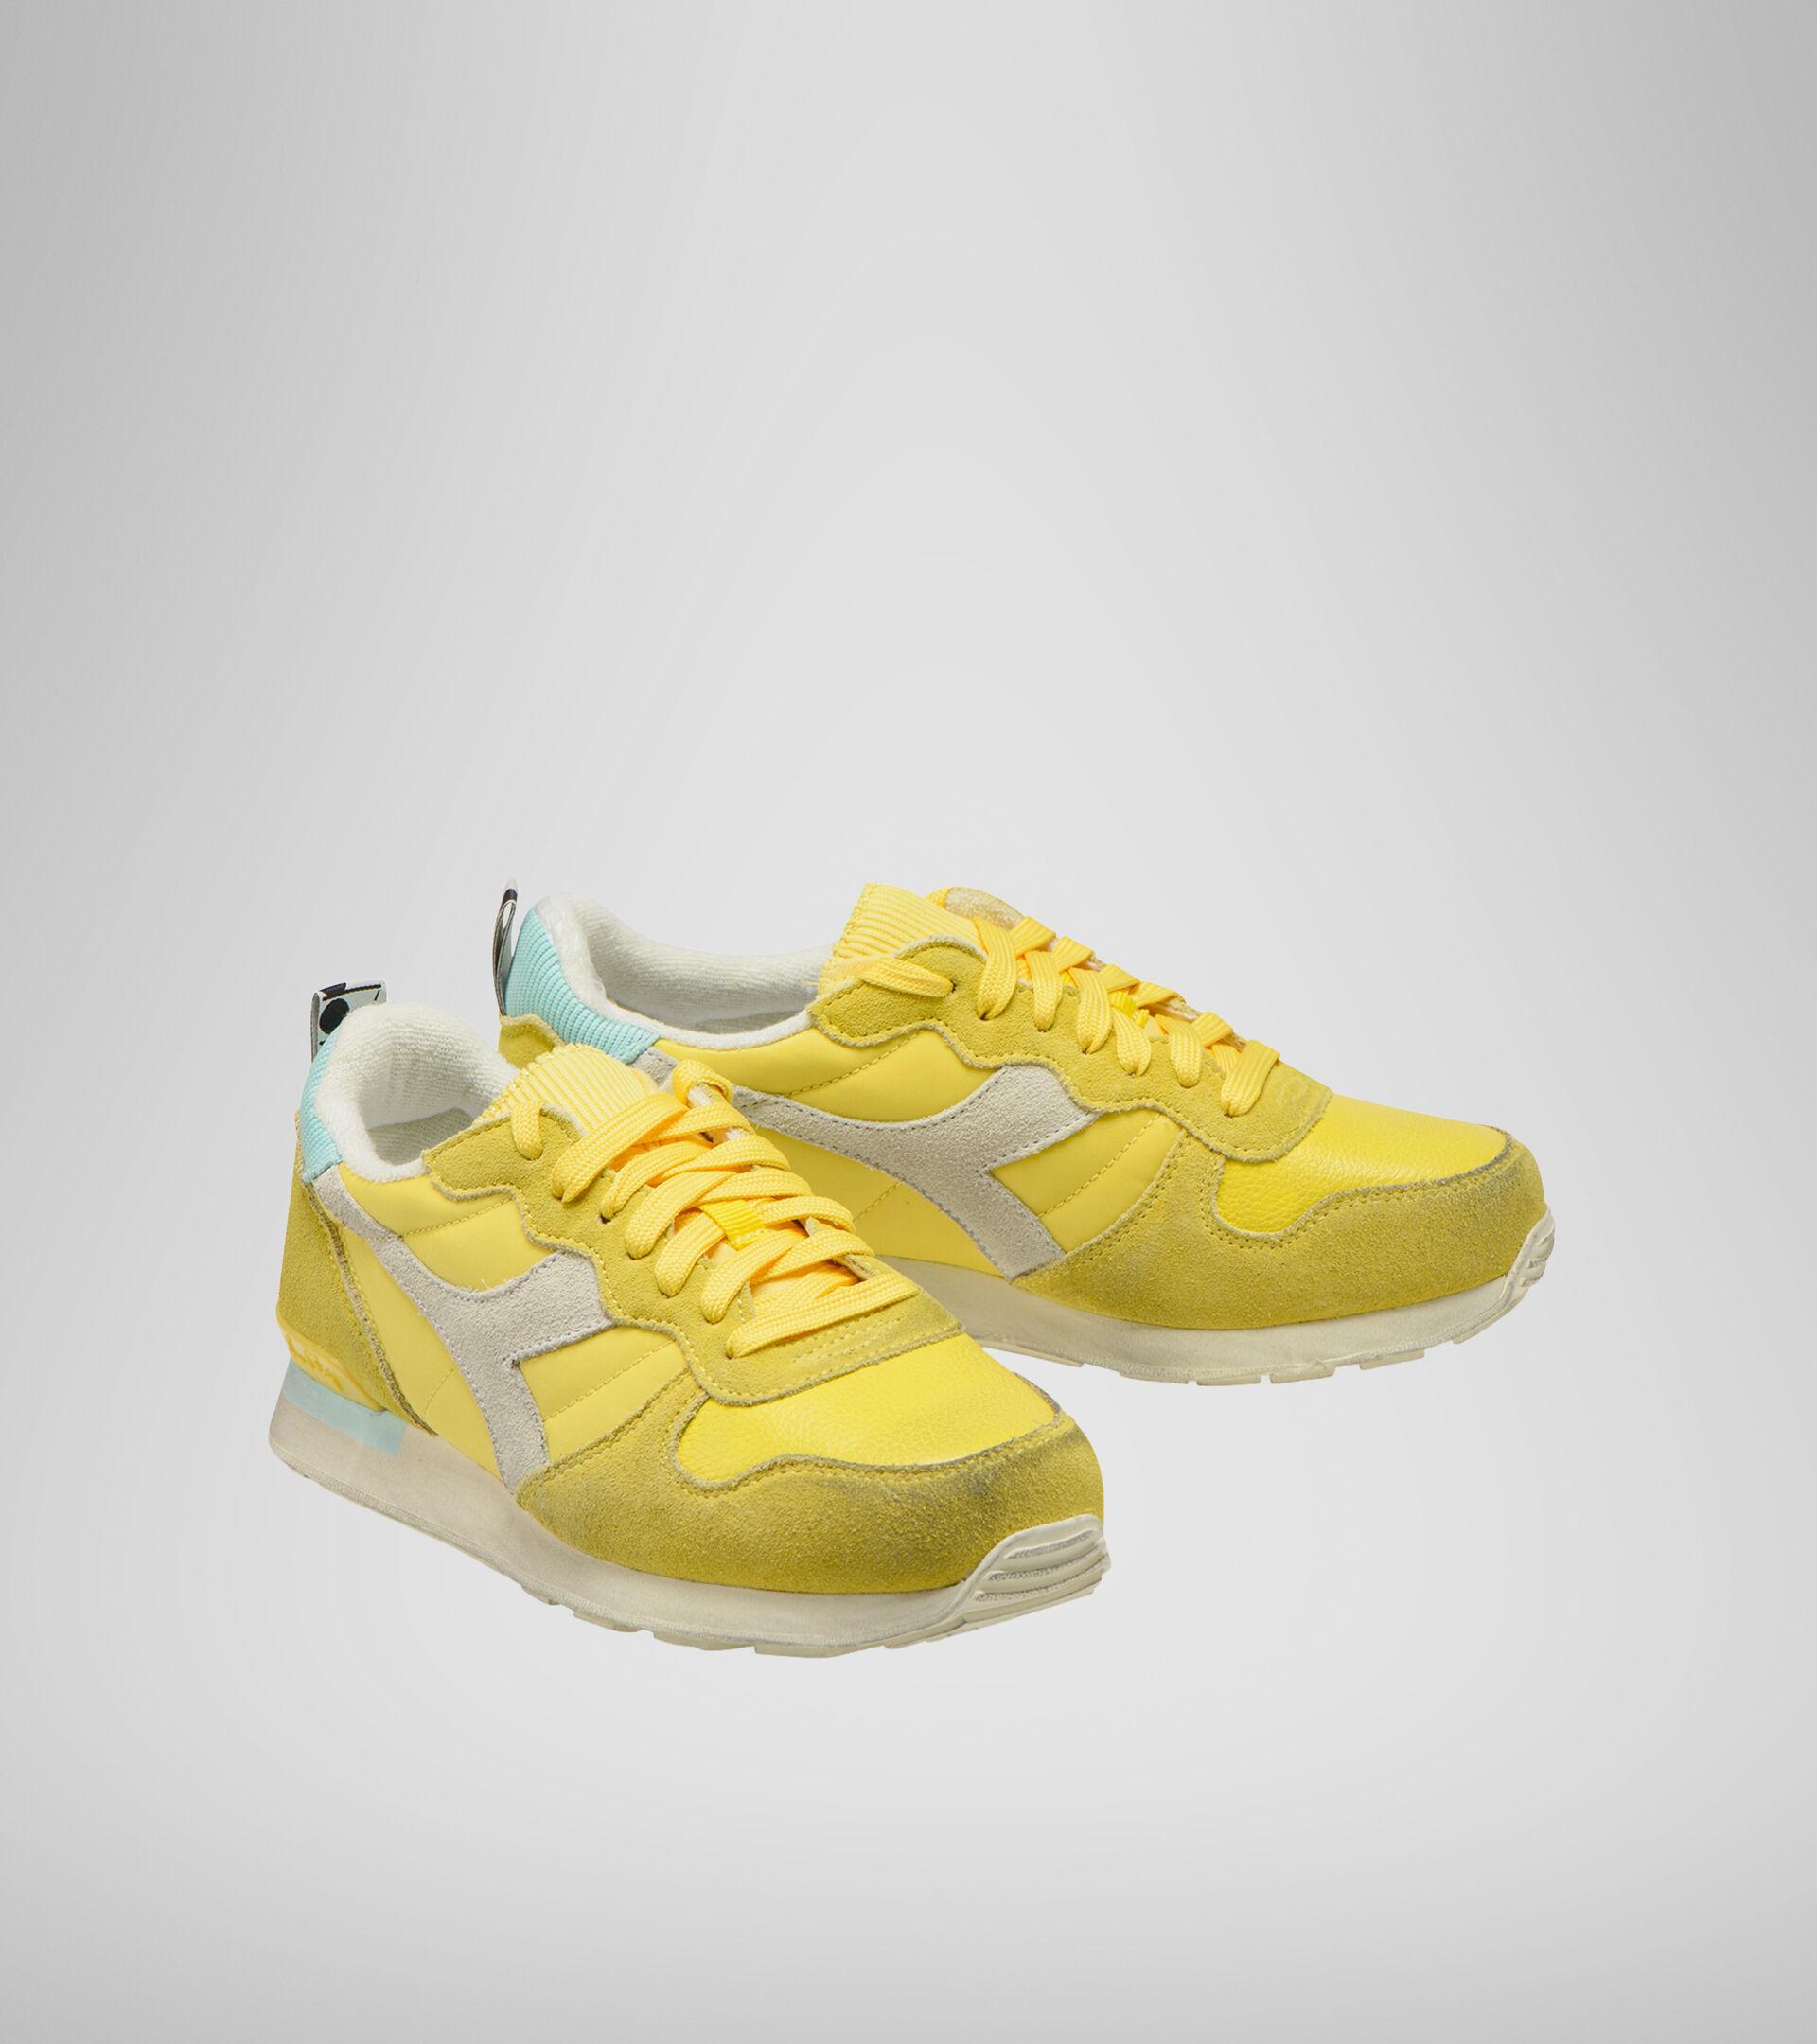 Footwear Sportswear DONNA CAMARO ICONA WN GOLDFINCH/BLUE TINT Diadora